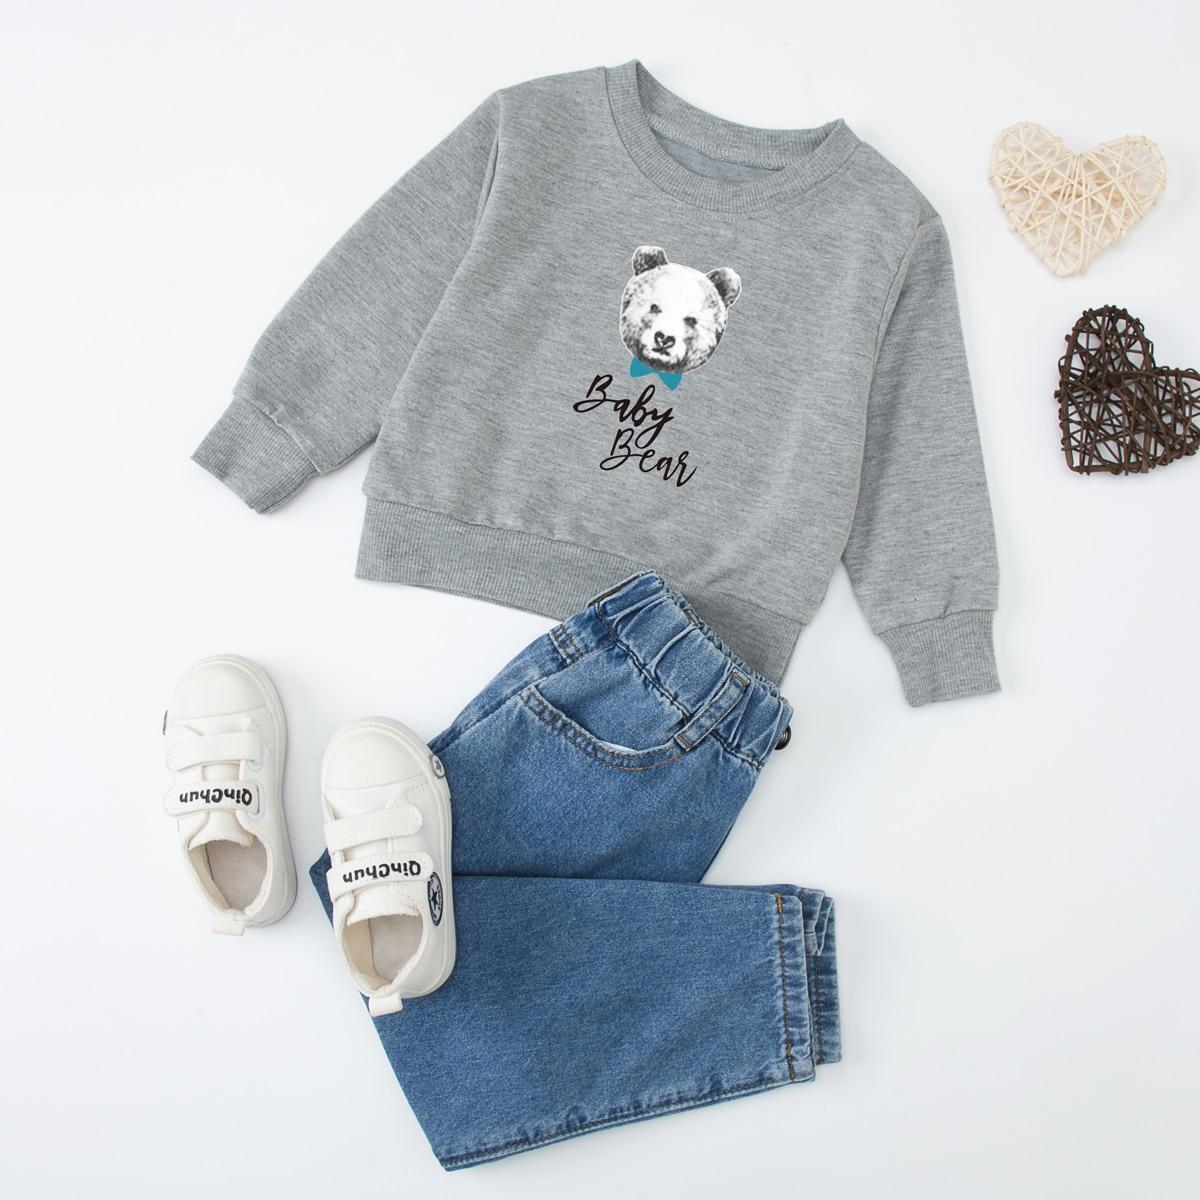 Toddler Boys 1pack Bear Print Sweatshirt, SHEIN  - buy with discount